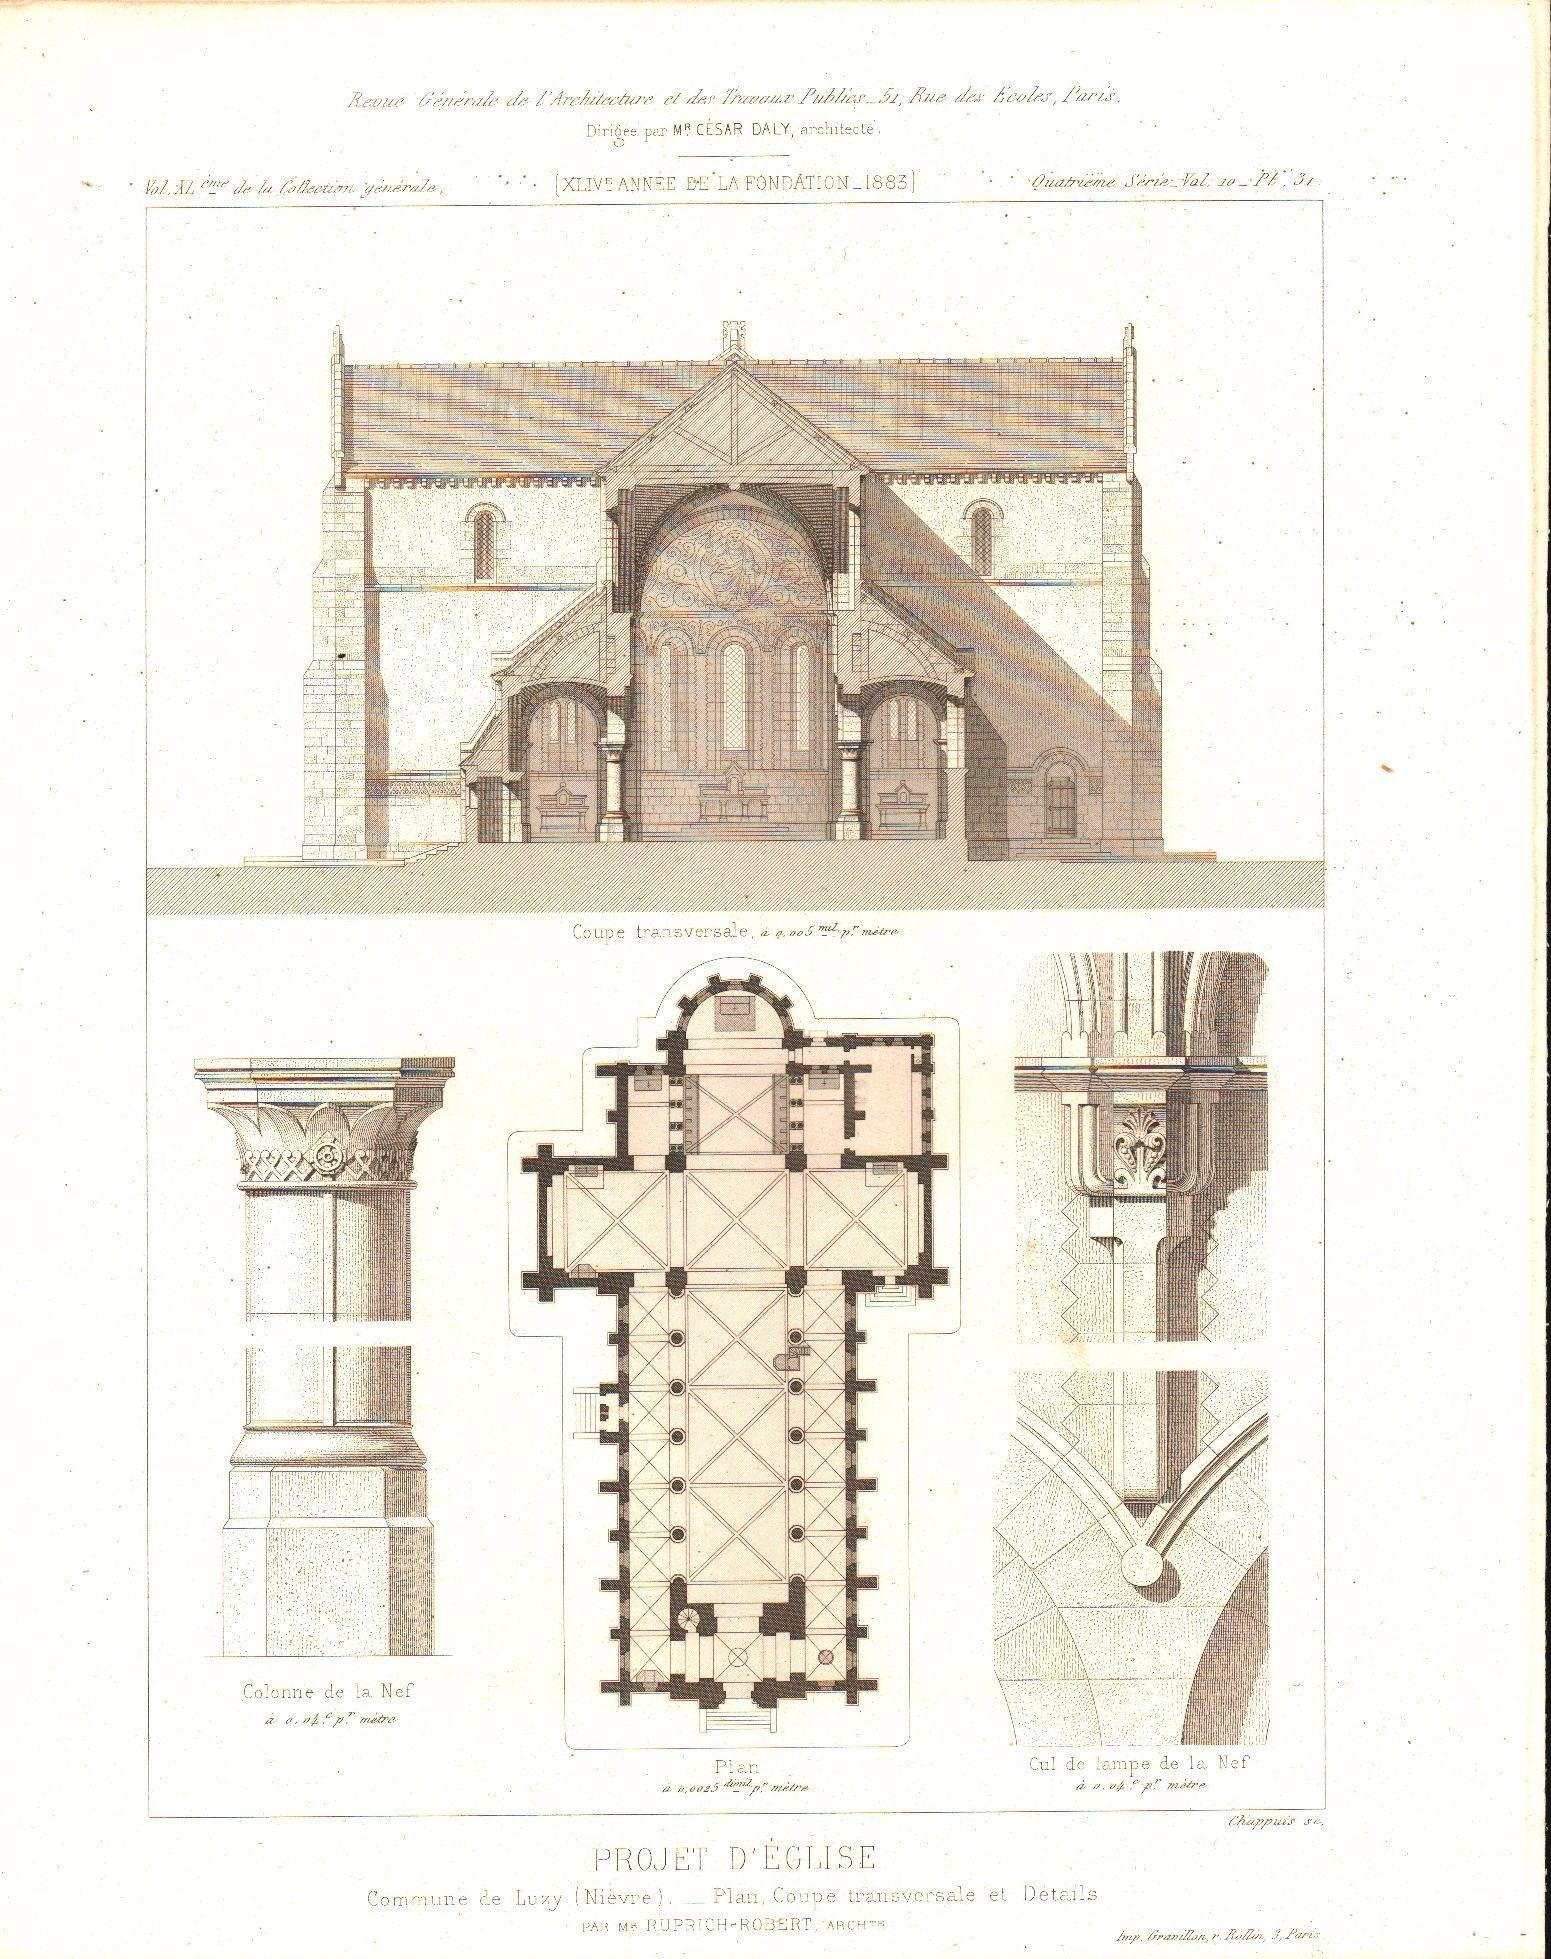 1551x1959 Architectural Church Plan Altar Design With Columns 1883